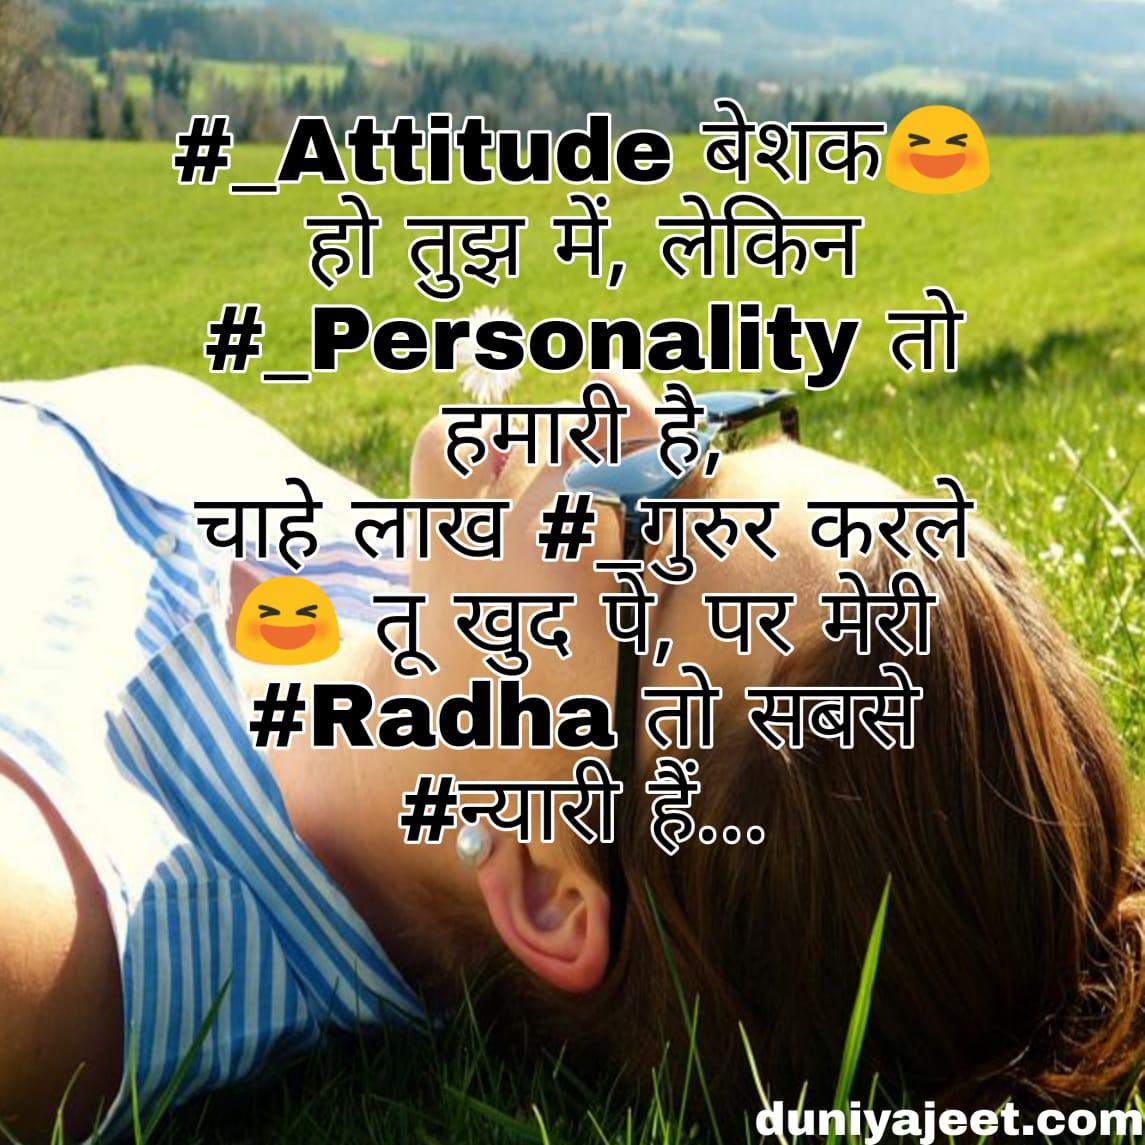 [30+] Best Attitude Fb Status in Hindi - Duniyajeet.com